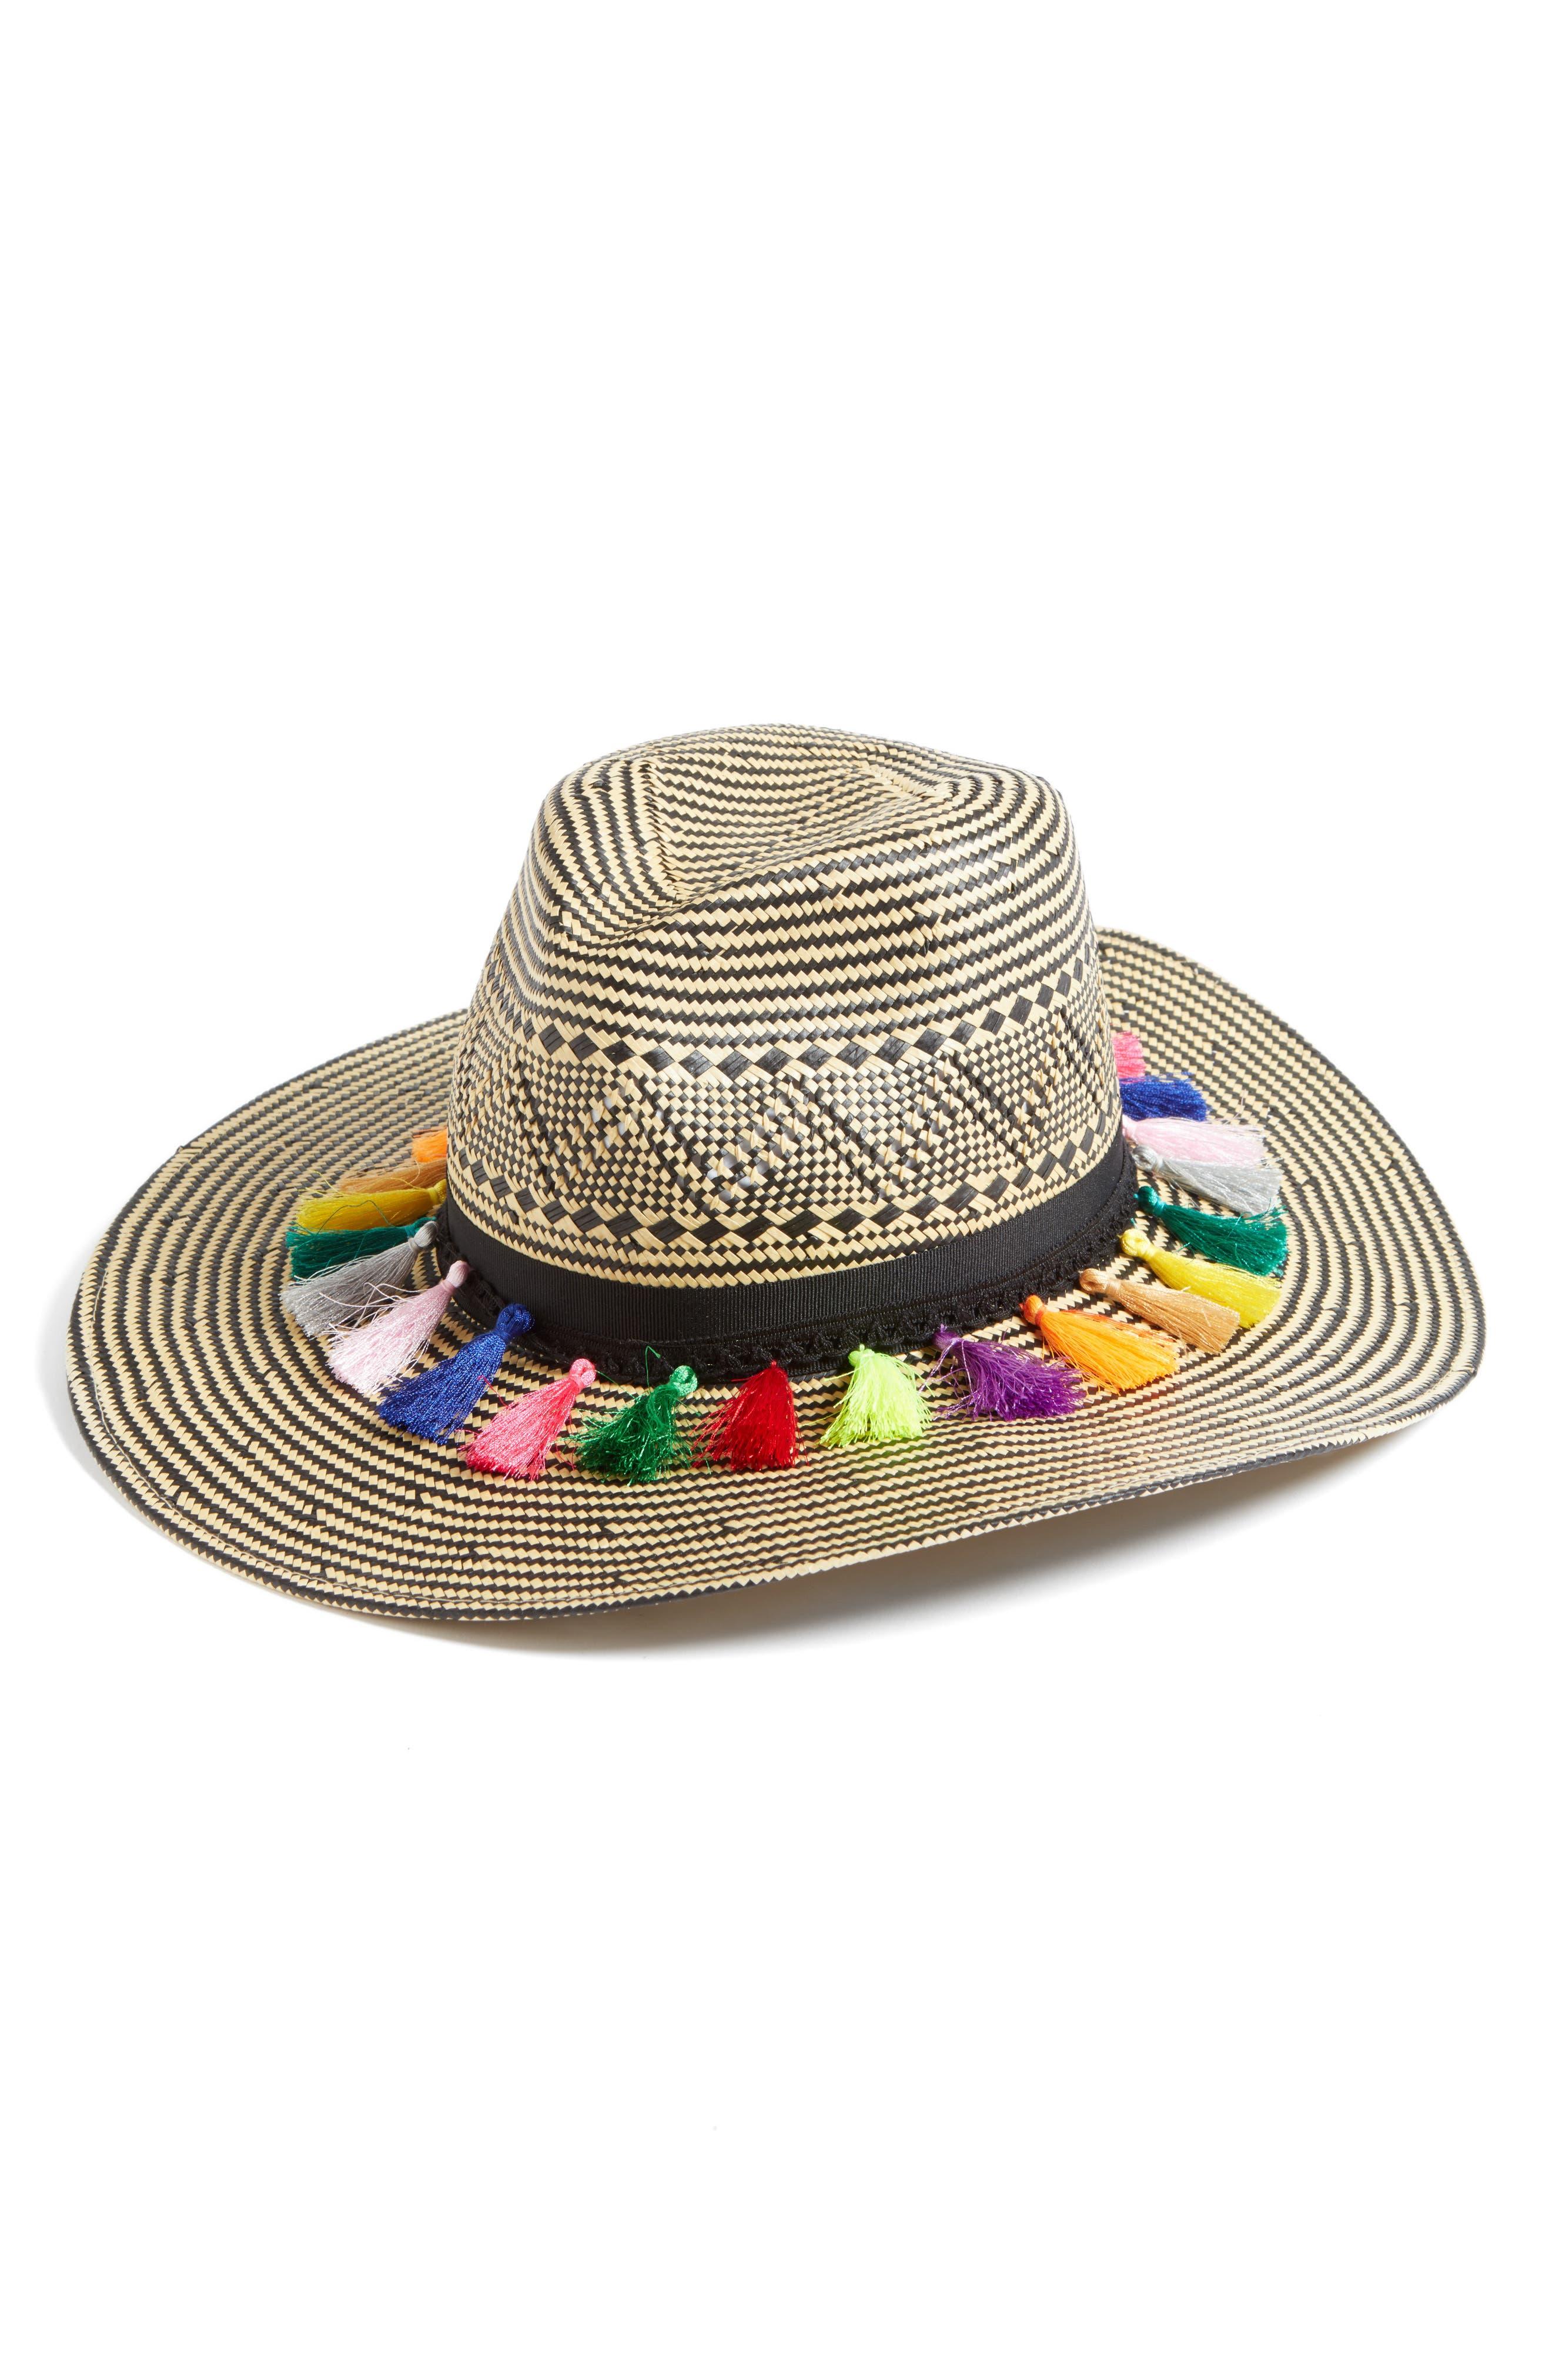 Playa Tassel Woven Safari Hat,                             Main thumbnail 1, color,